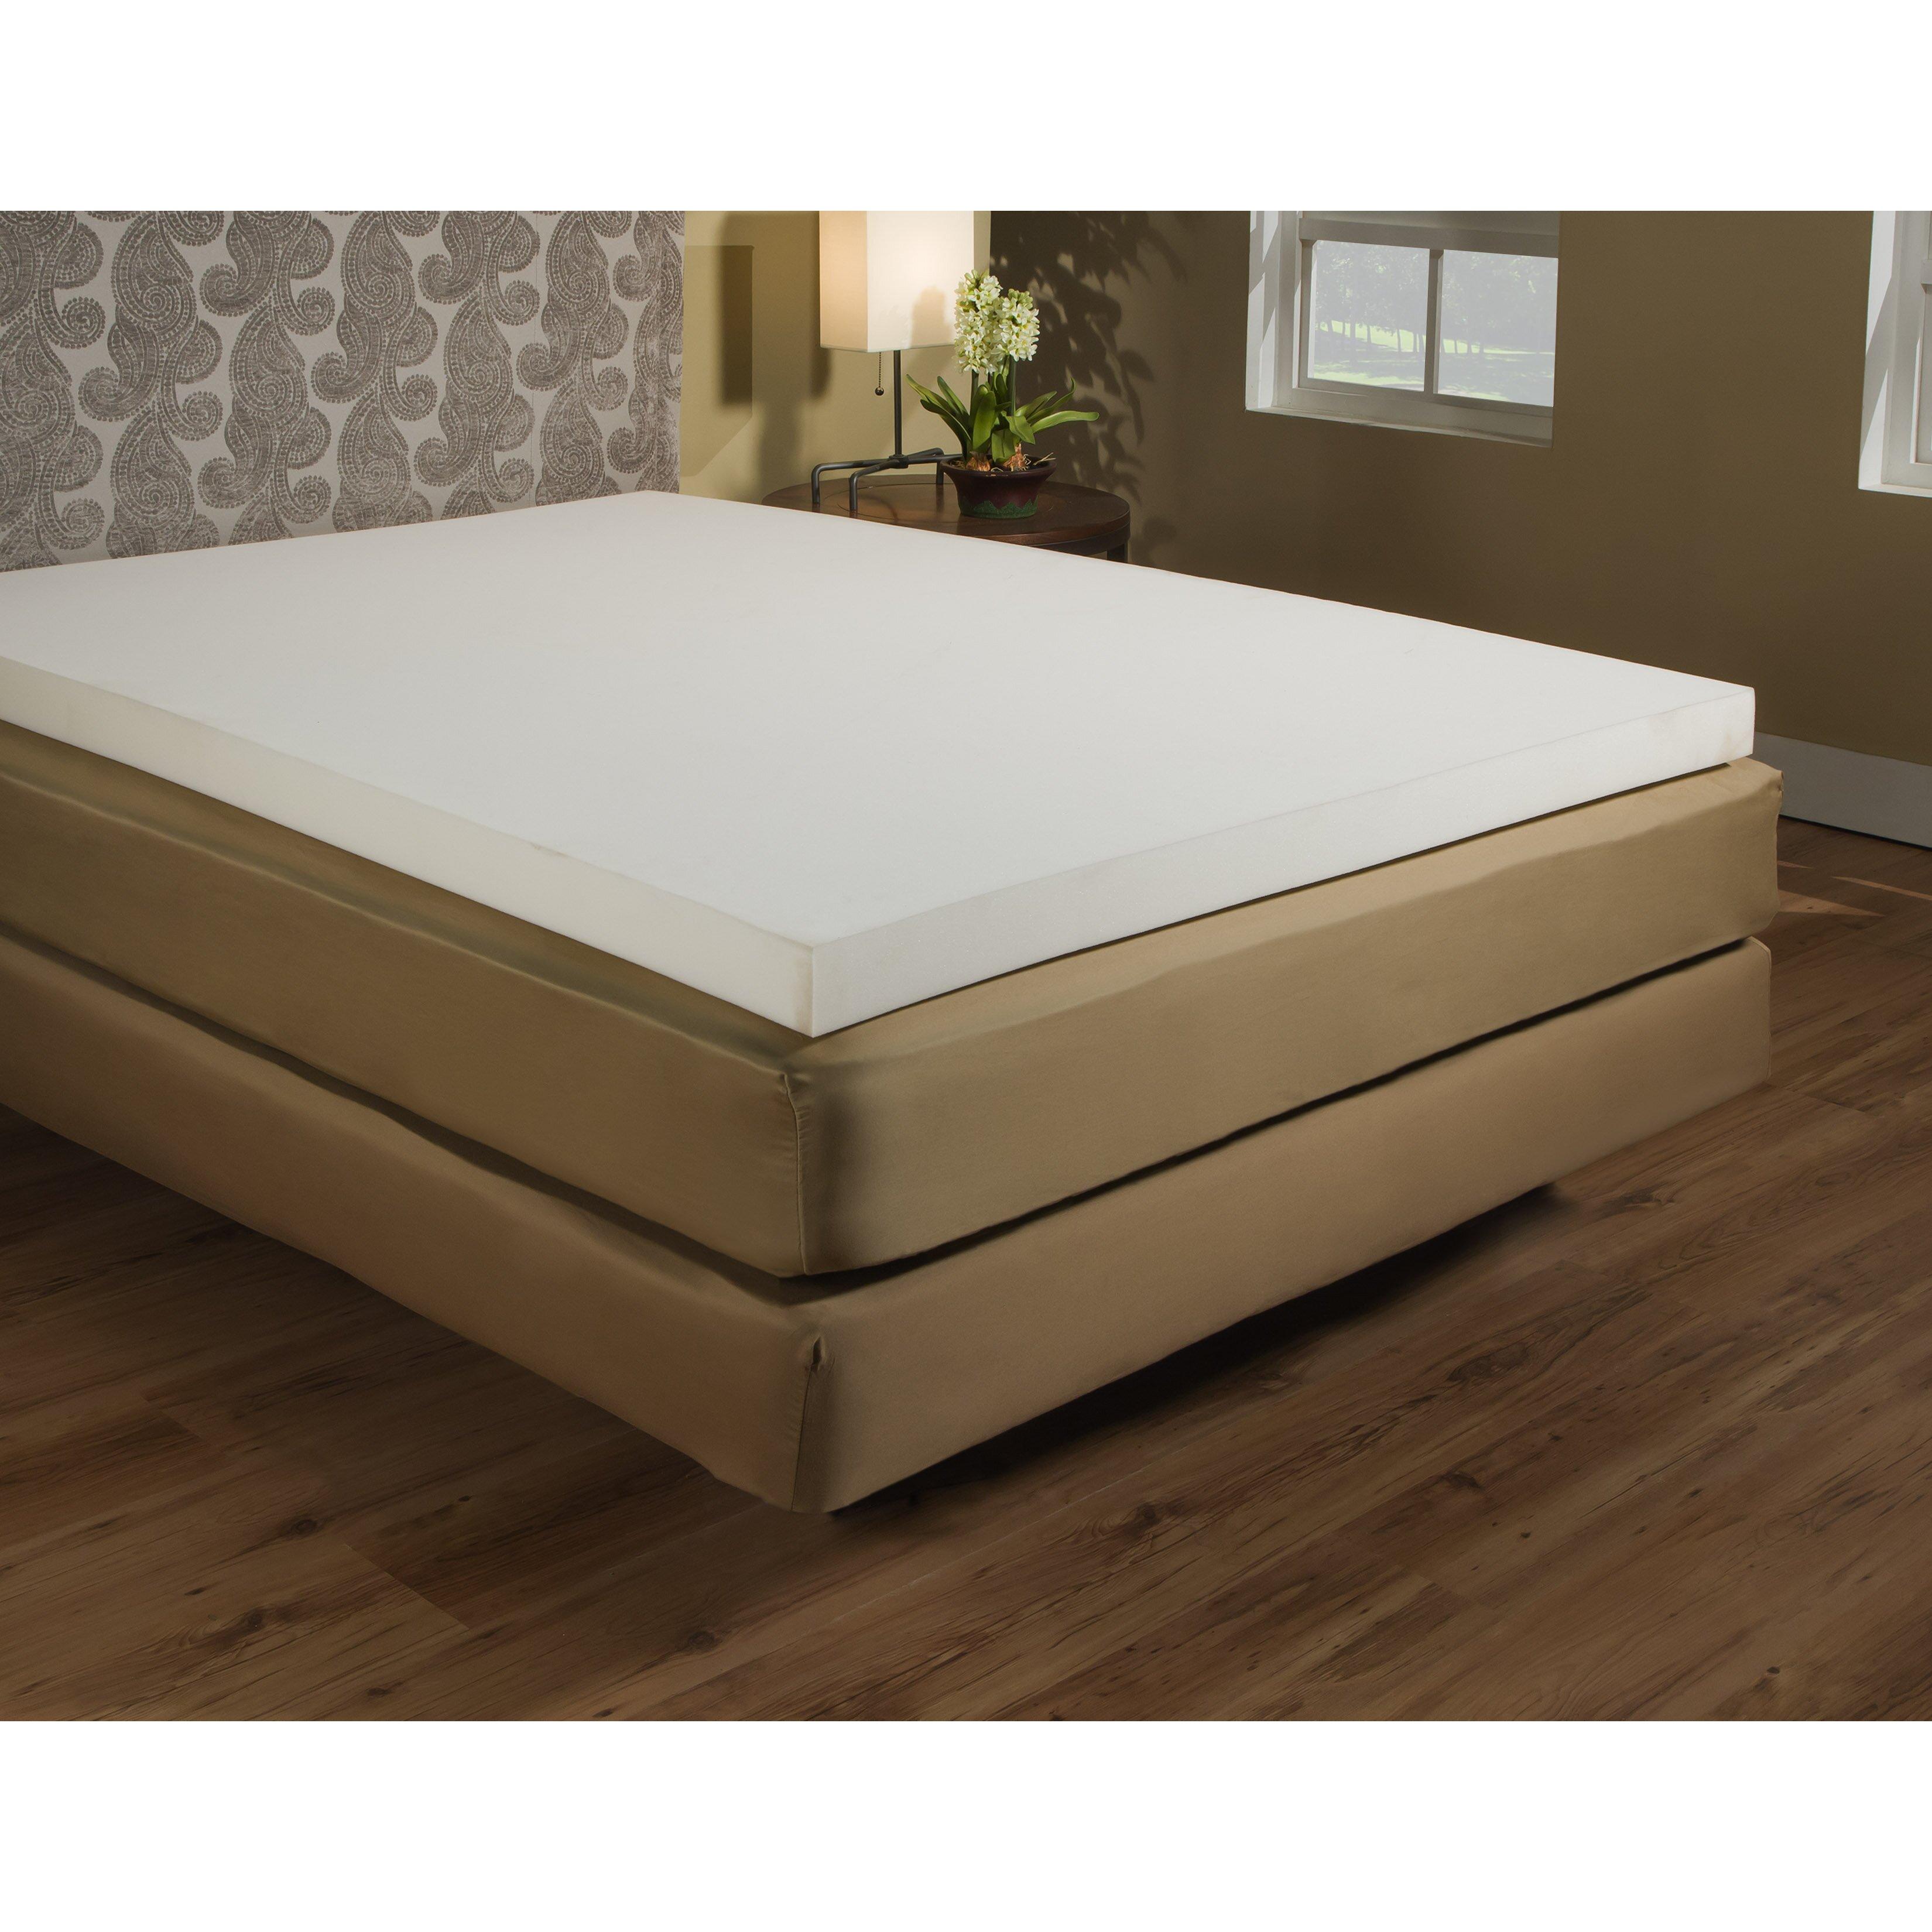 microfiber sofa bed. detailed images. acme hamar orange wood frame